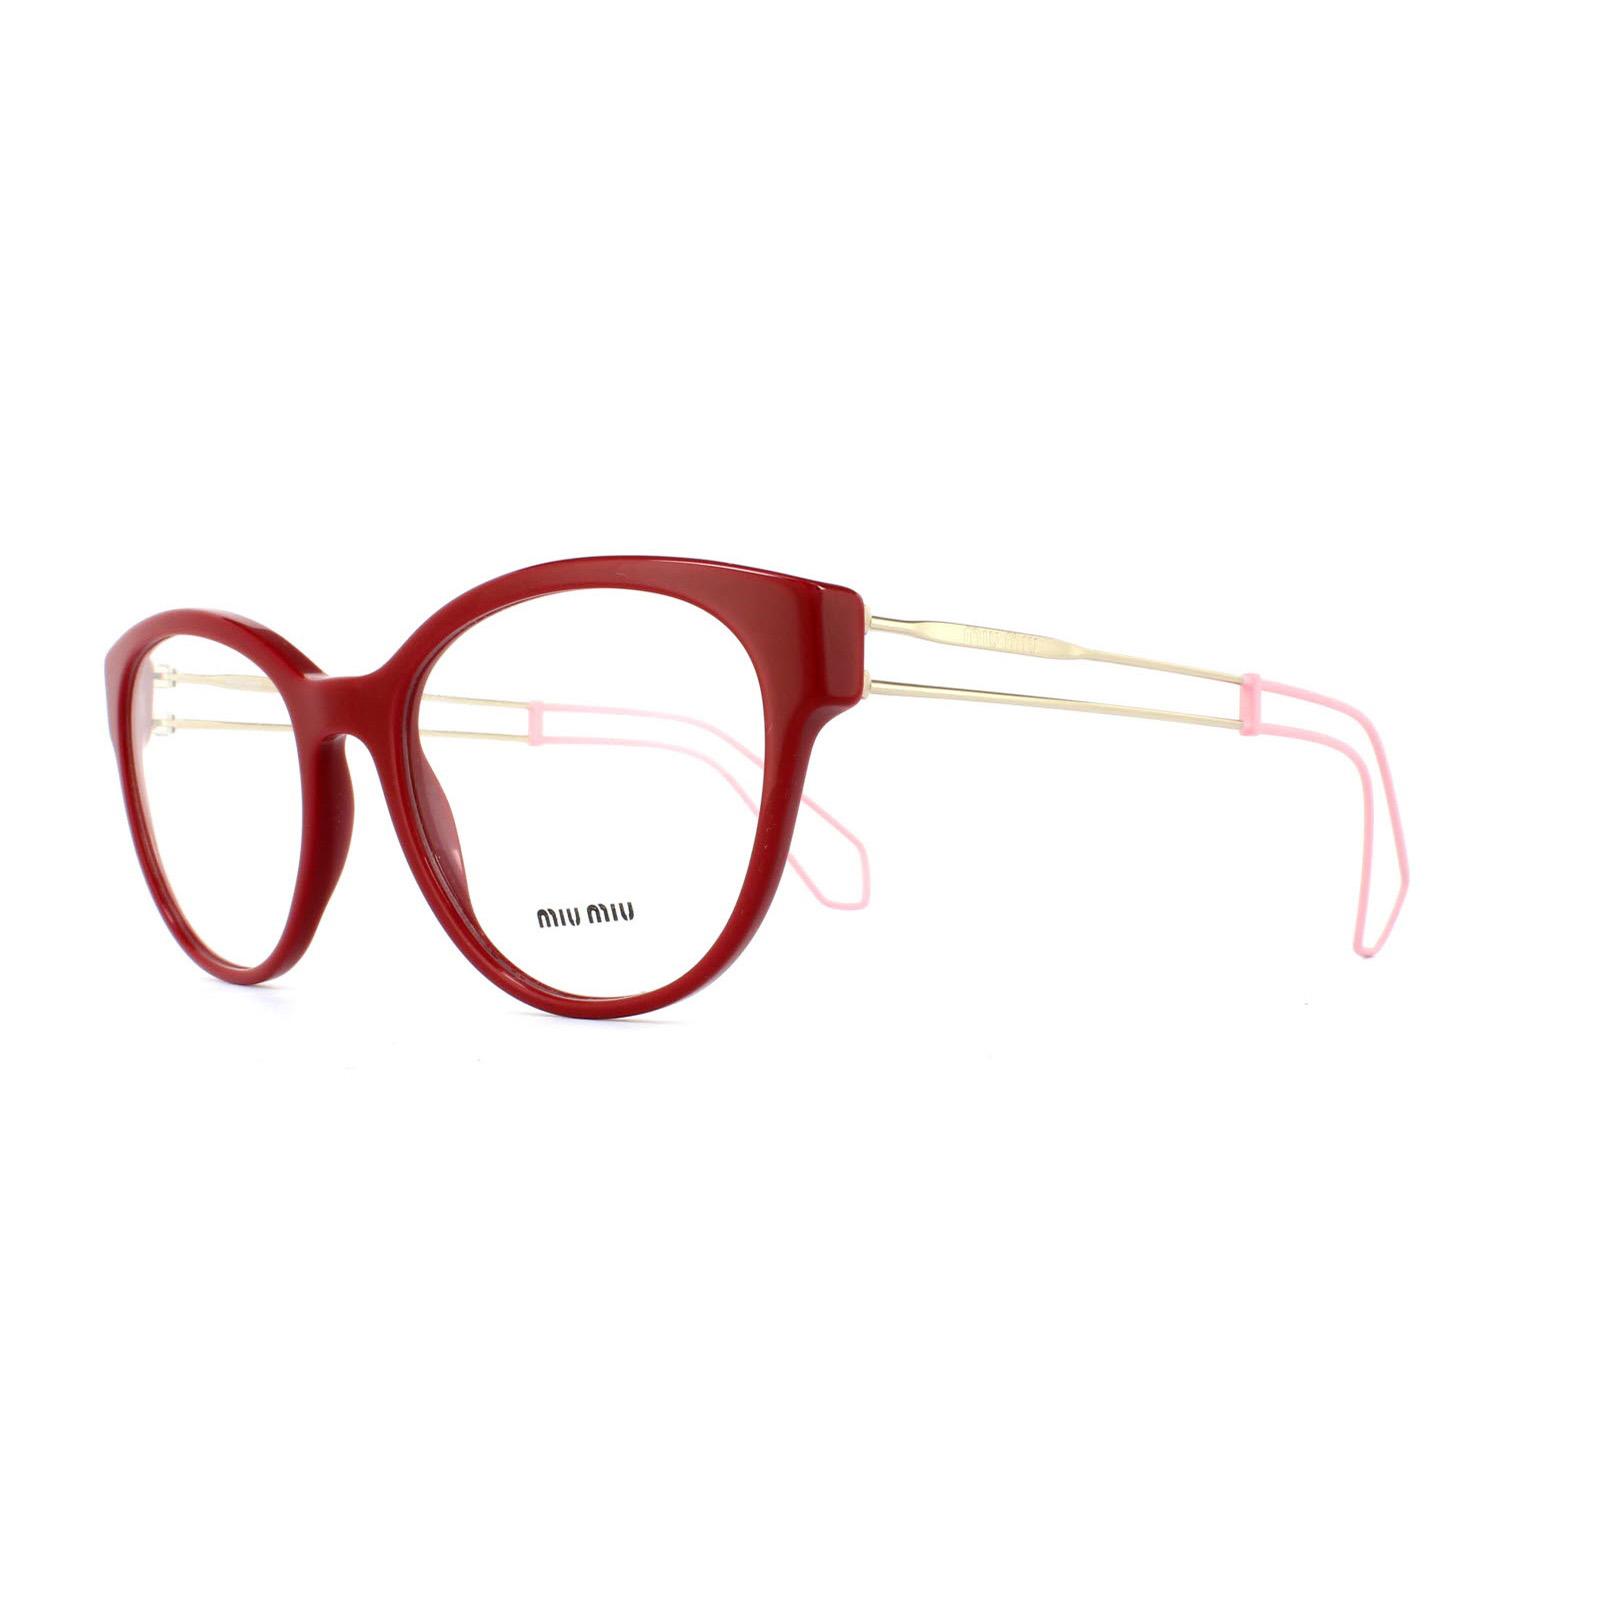 a4715ff039 Miu Glasses Frames 03pv Usl1o1 Red Womens 52mm